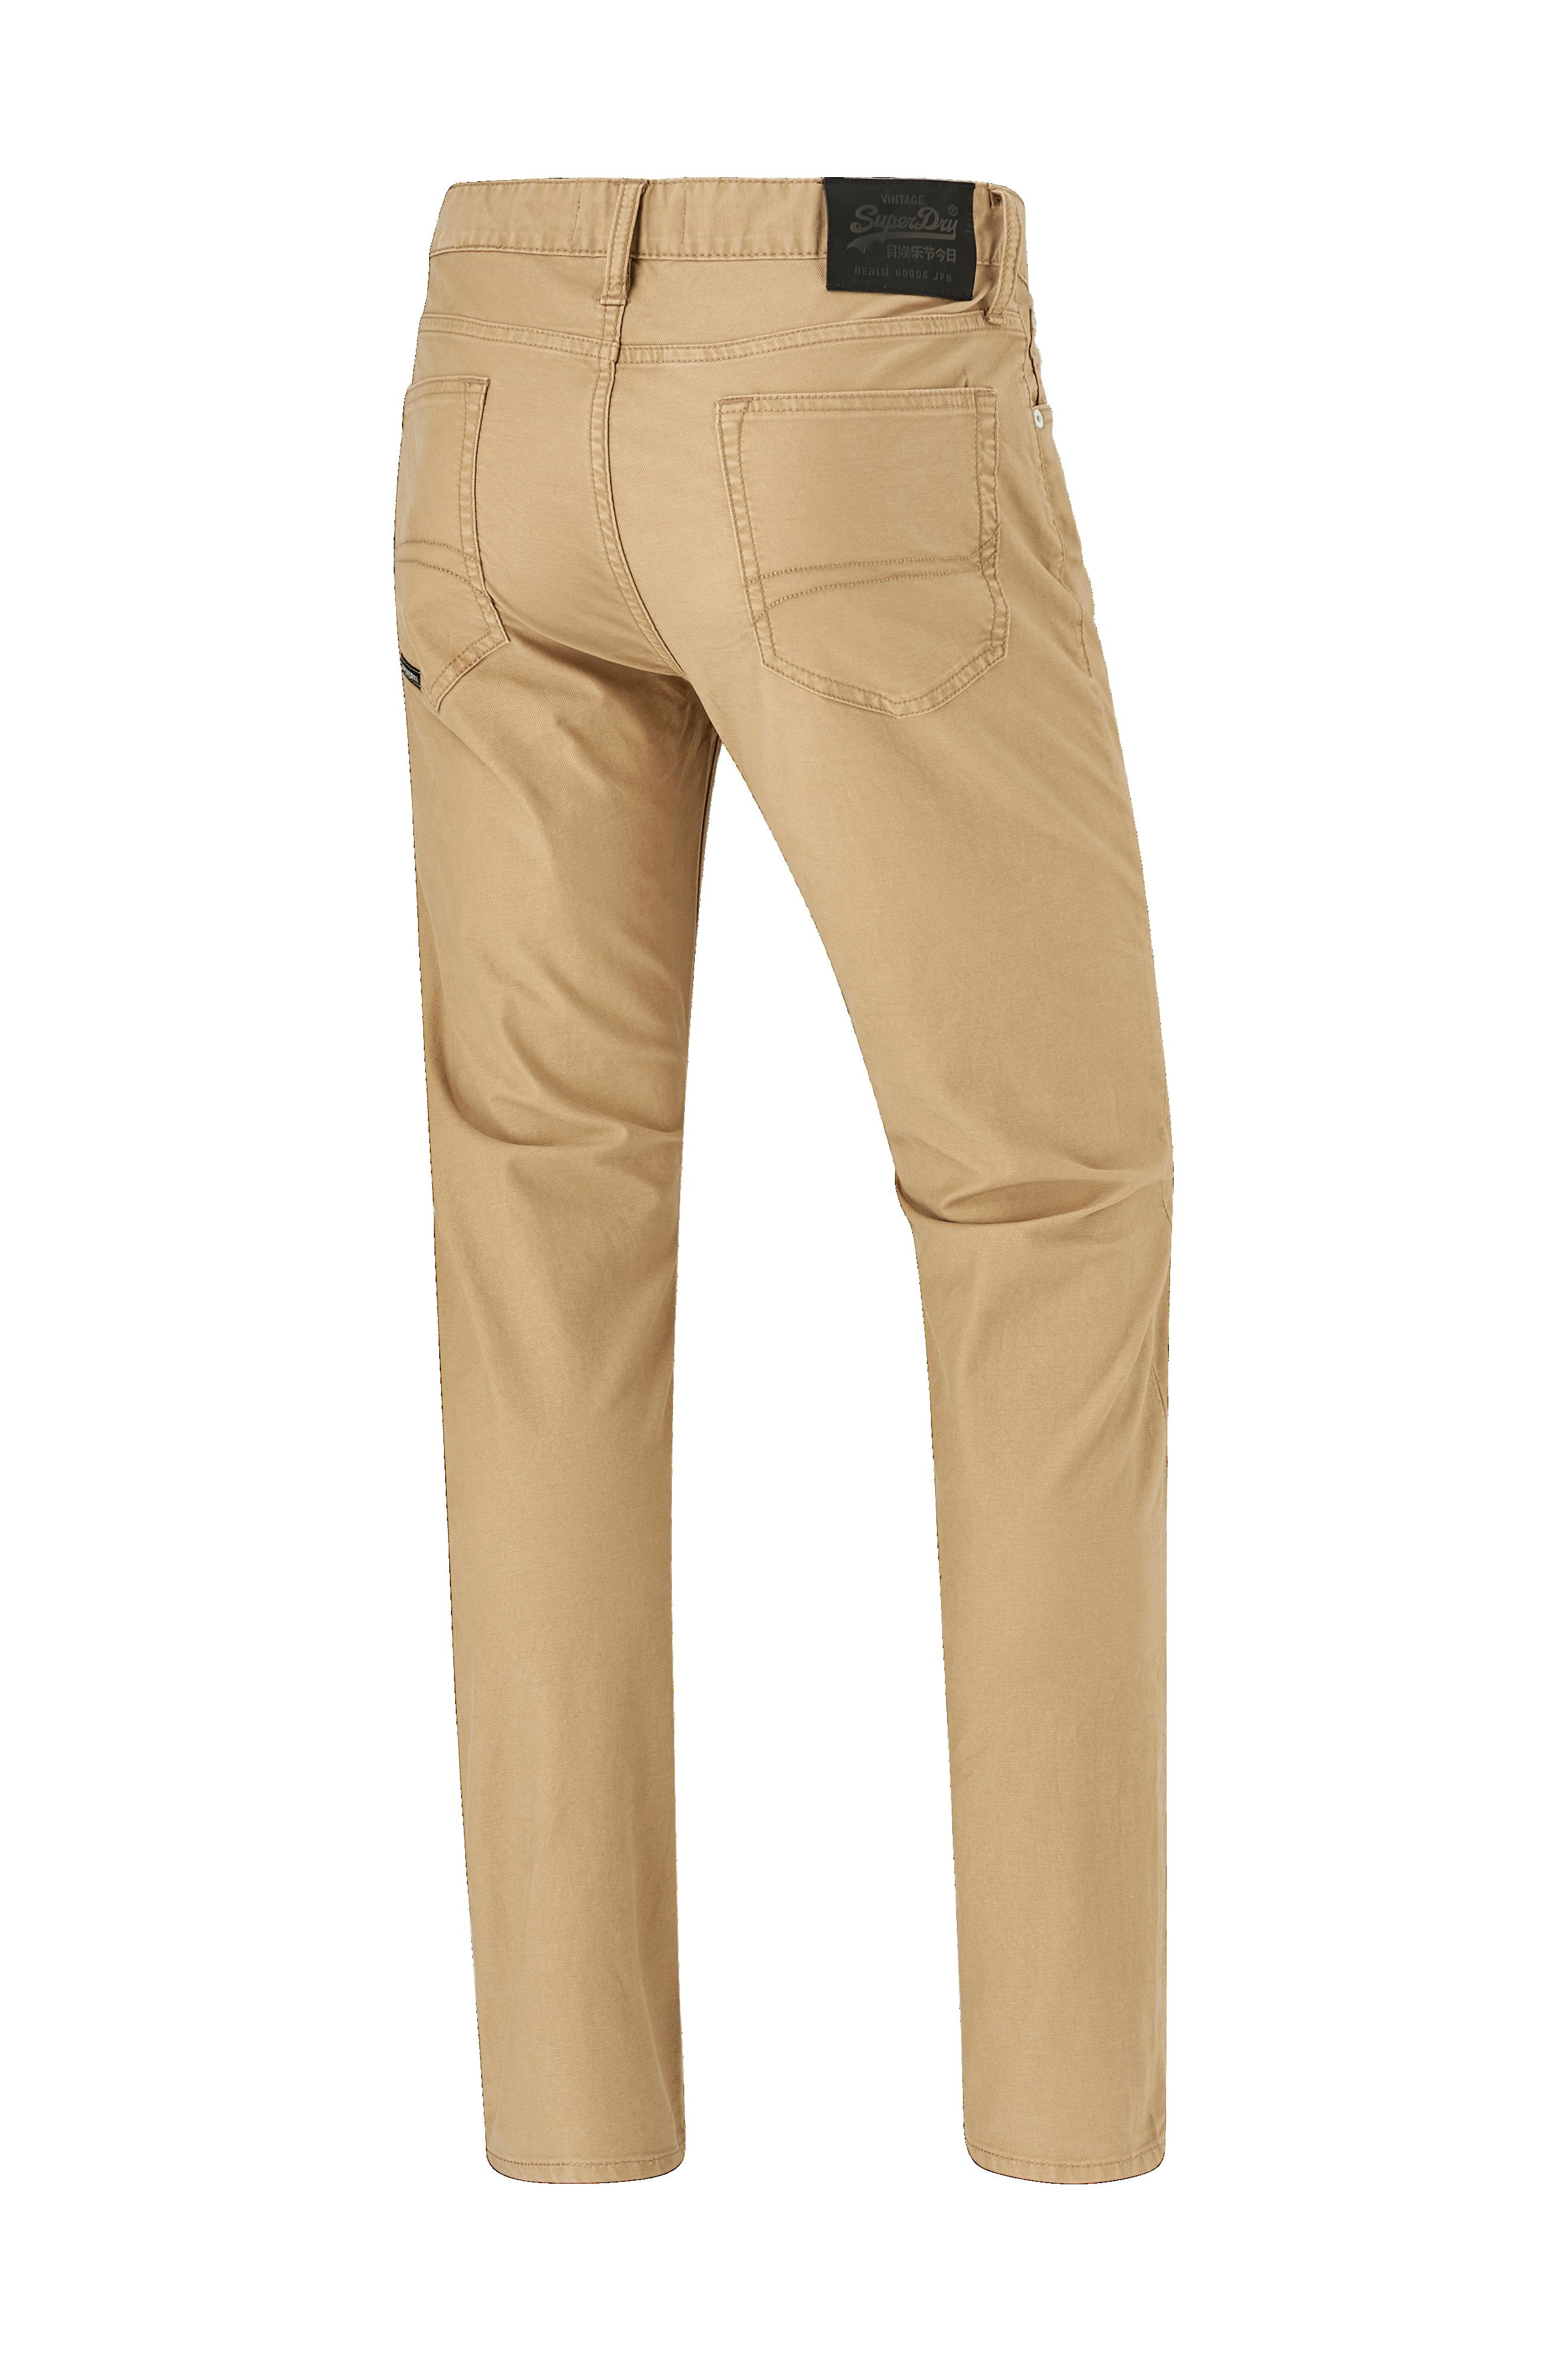 Superdry Jeans Edit Tyler Slim Dbl Dye Twills - Brun - Herr